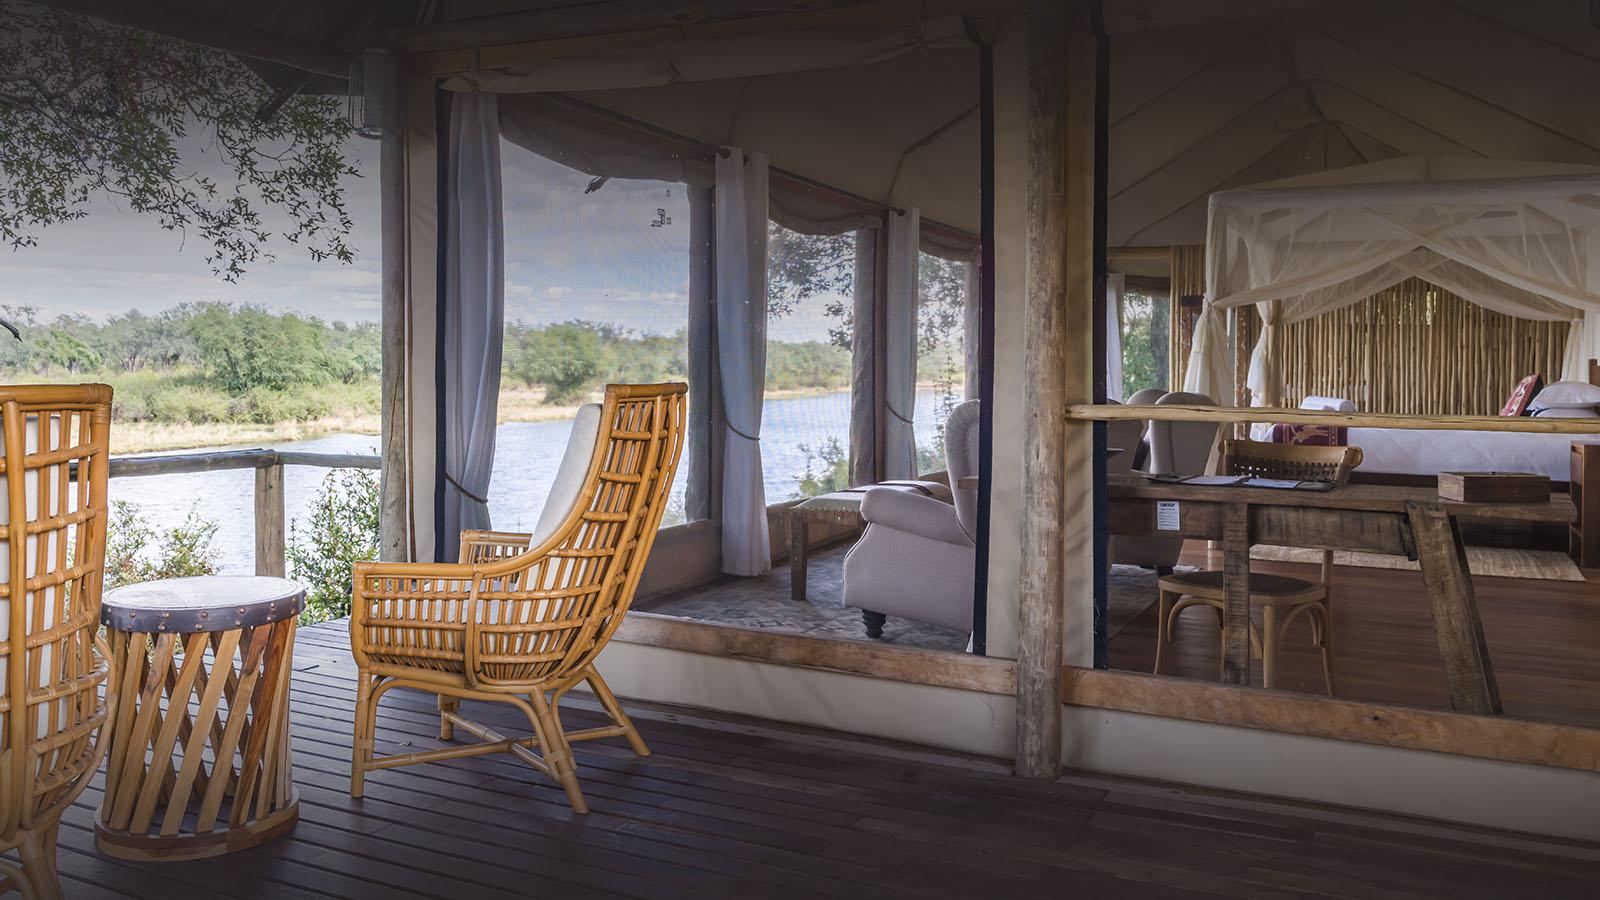 amanzi-lodge-zambia-in-style-safari-packages-lodges-lower-zambezi-rustic-intimate-safari-deck-chairs